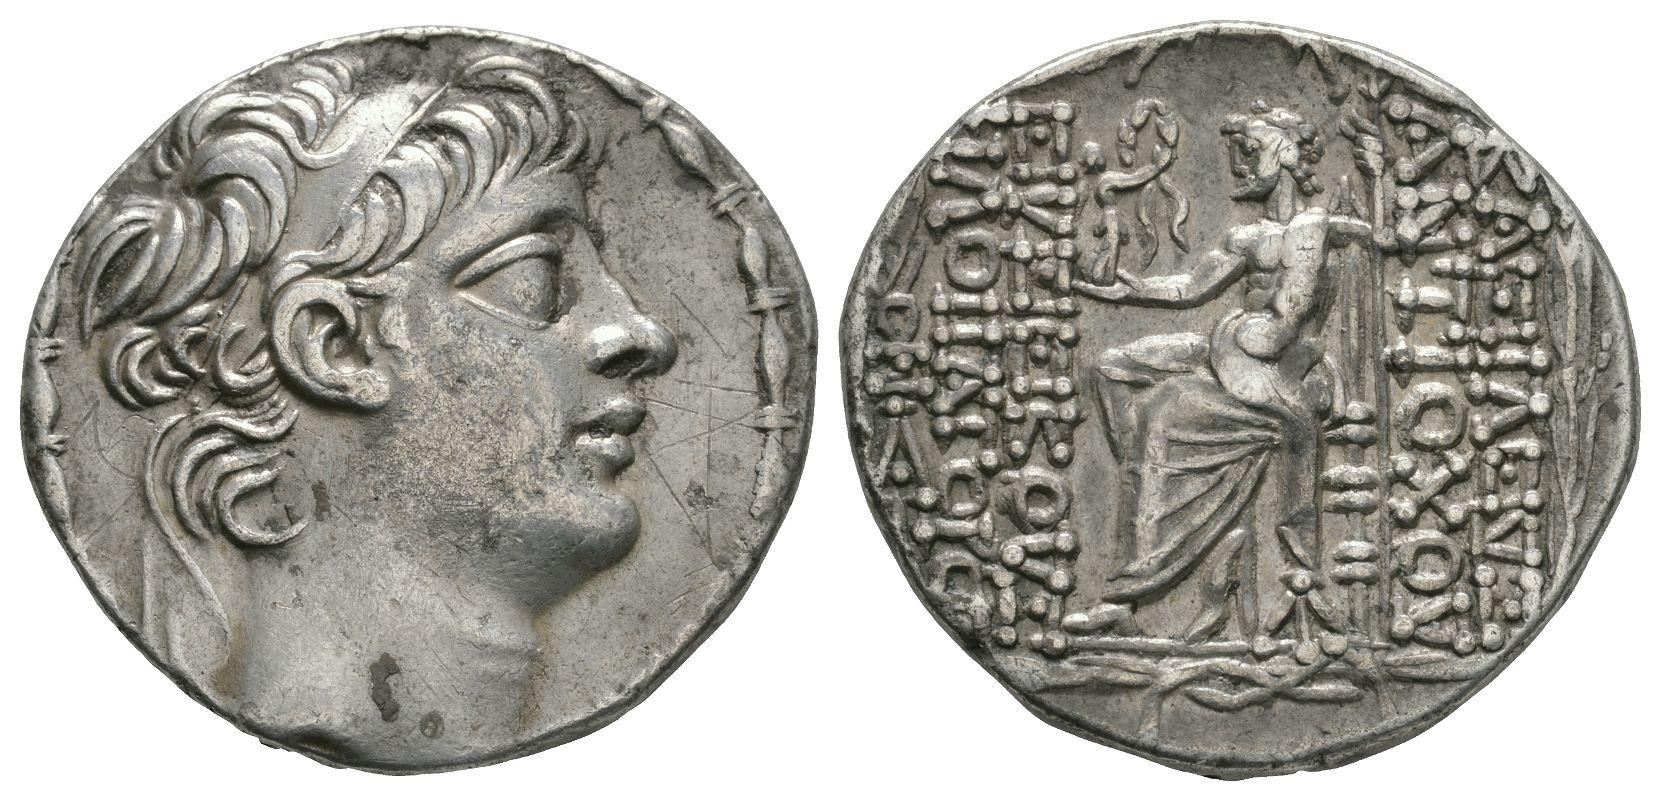 Ancient Greek Coins - Syria - Antiochos X Eusebus Philopater - Zeus Tetradrachm